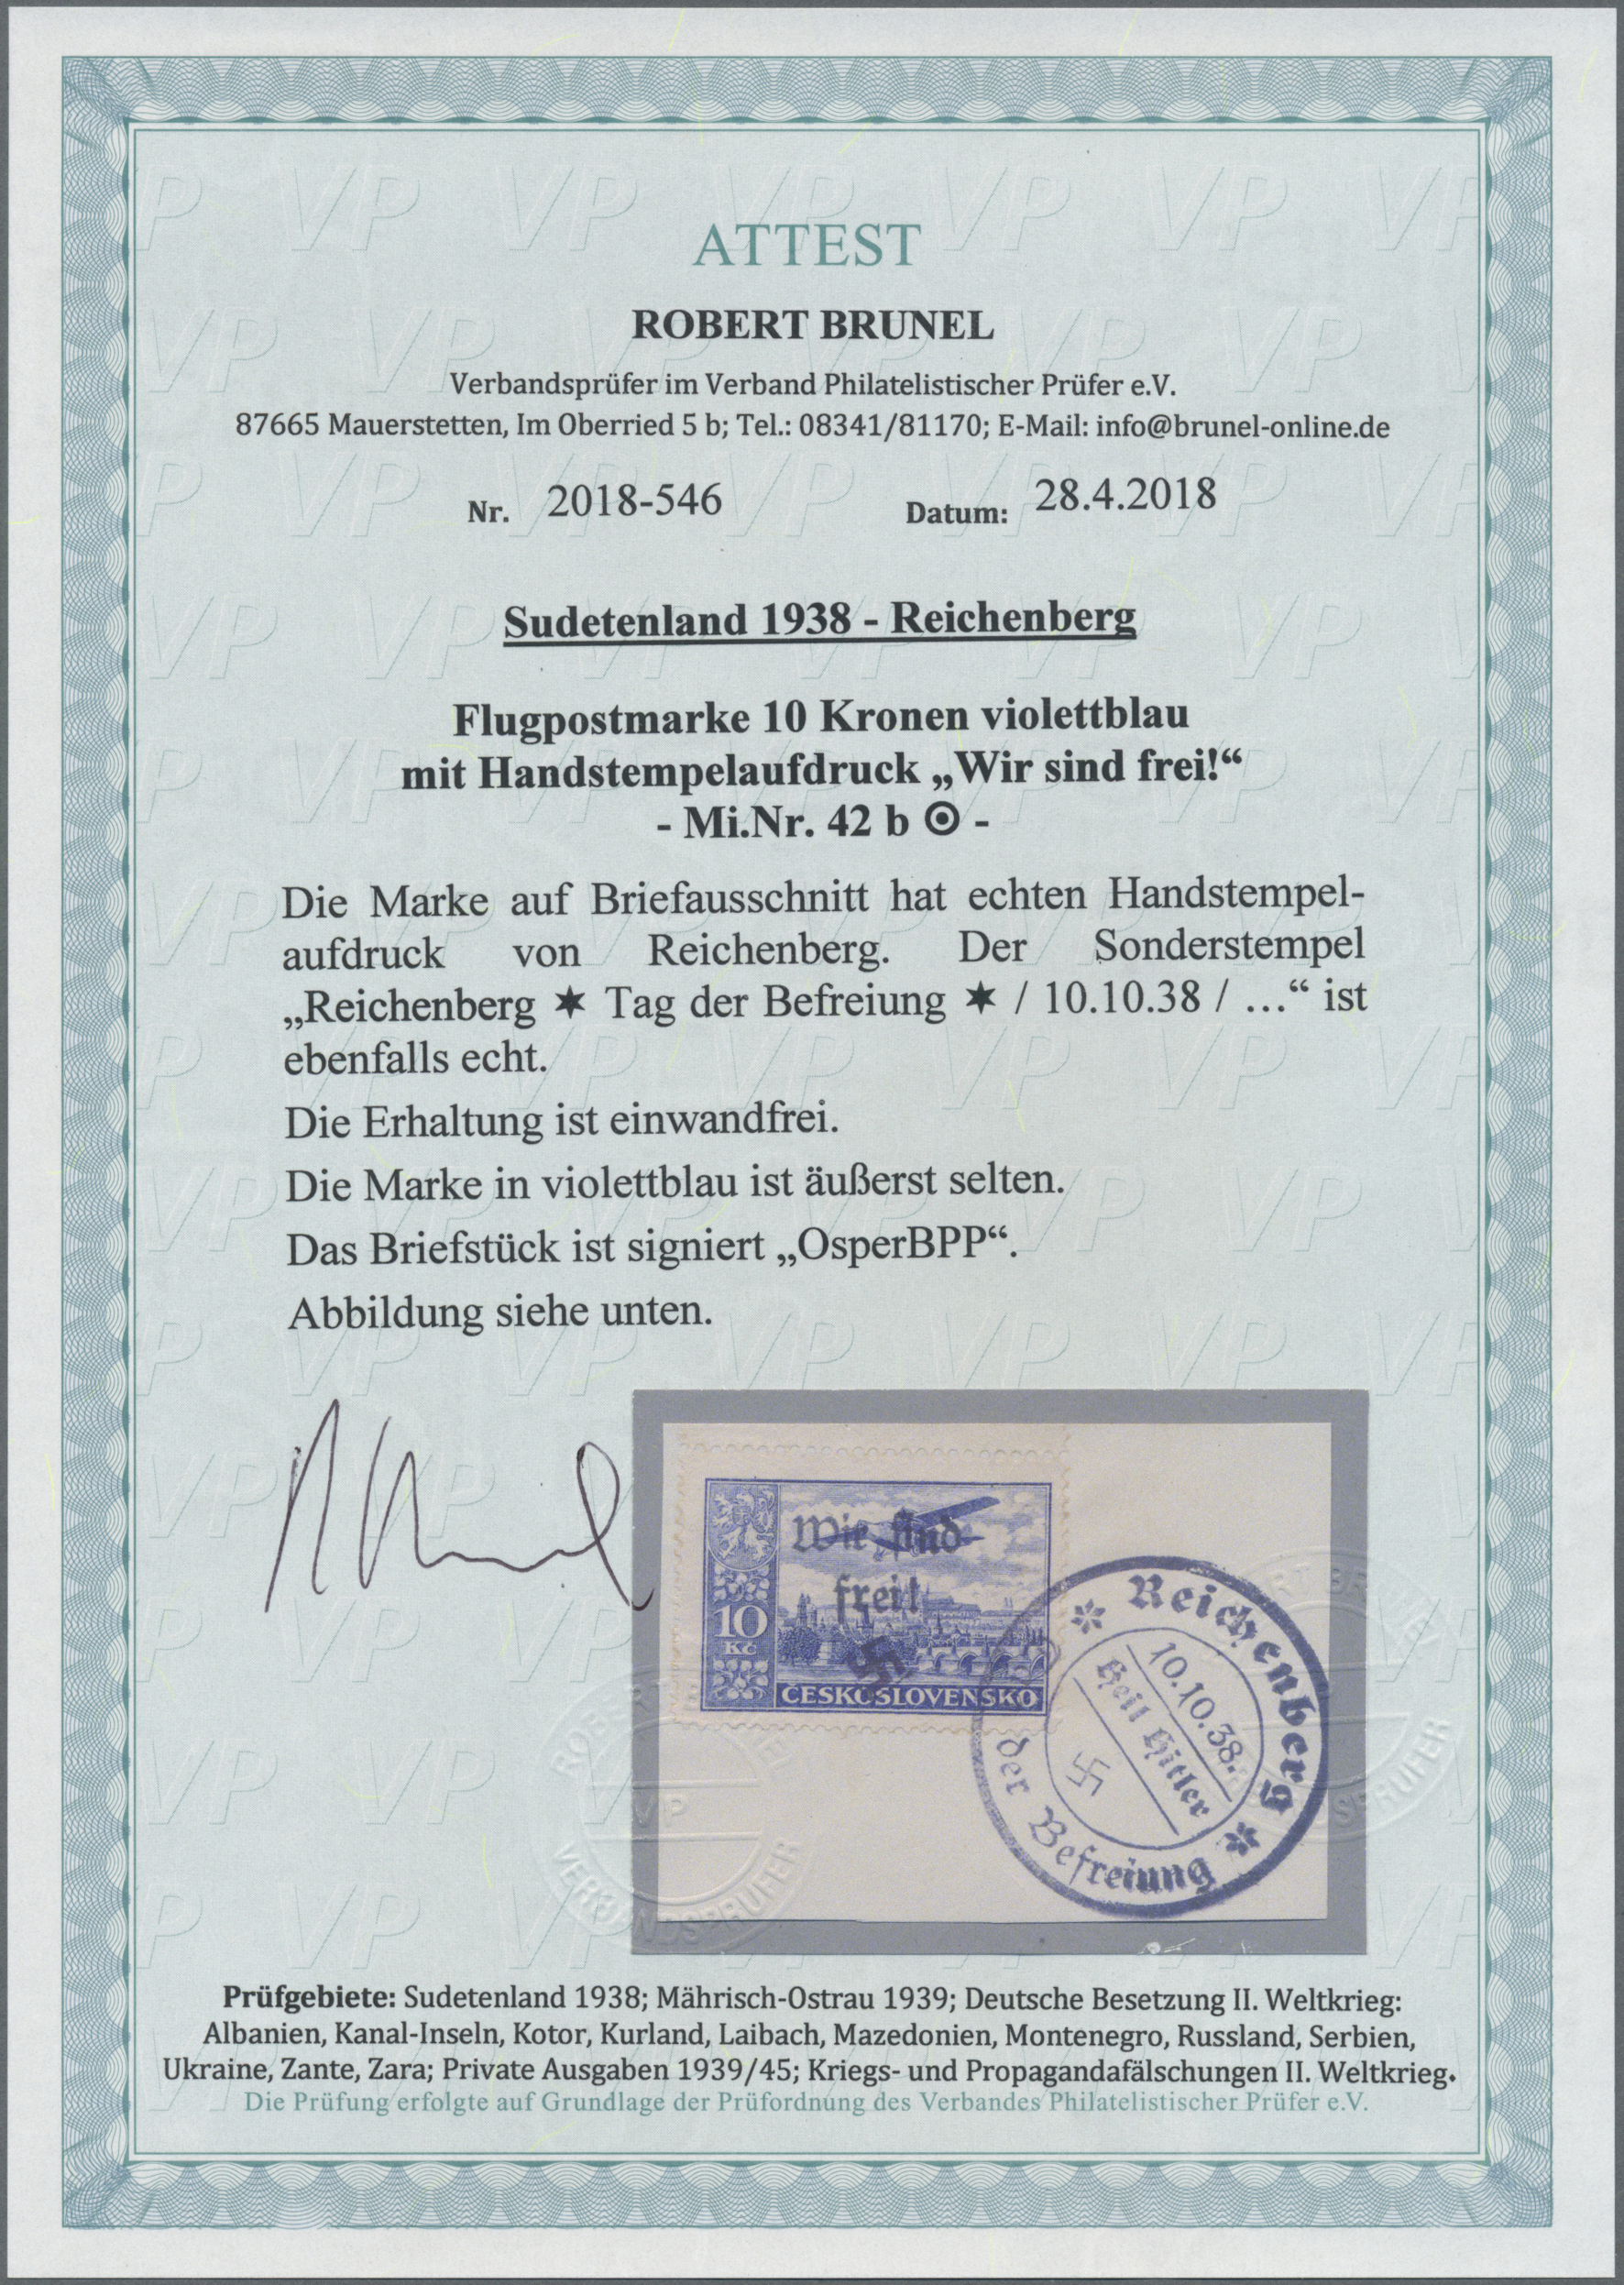 Lot 151 - Sudetenland - Reichenberg  -  Auktionshaus Christoph Gärtner GmbH & Co. KG Auction #41 Special auction part one